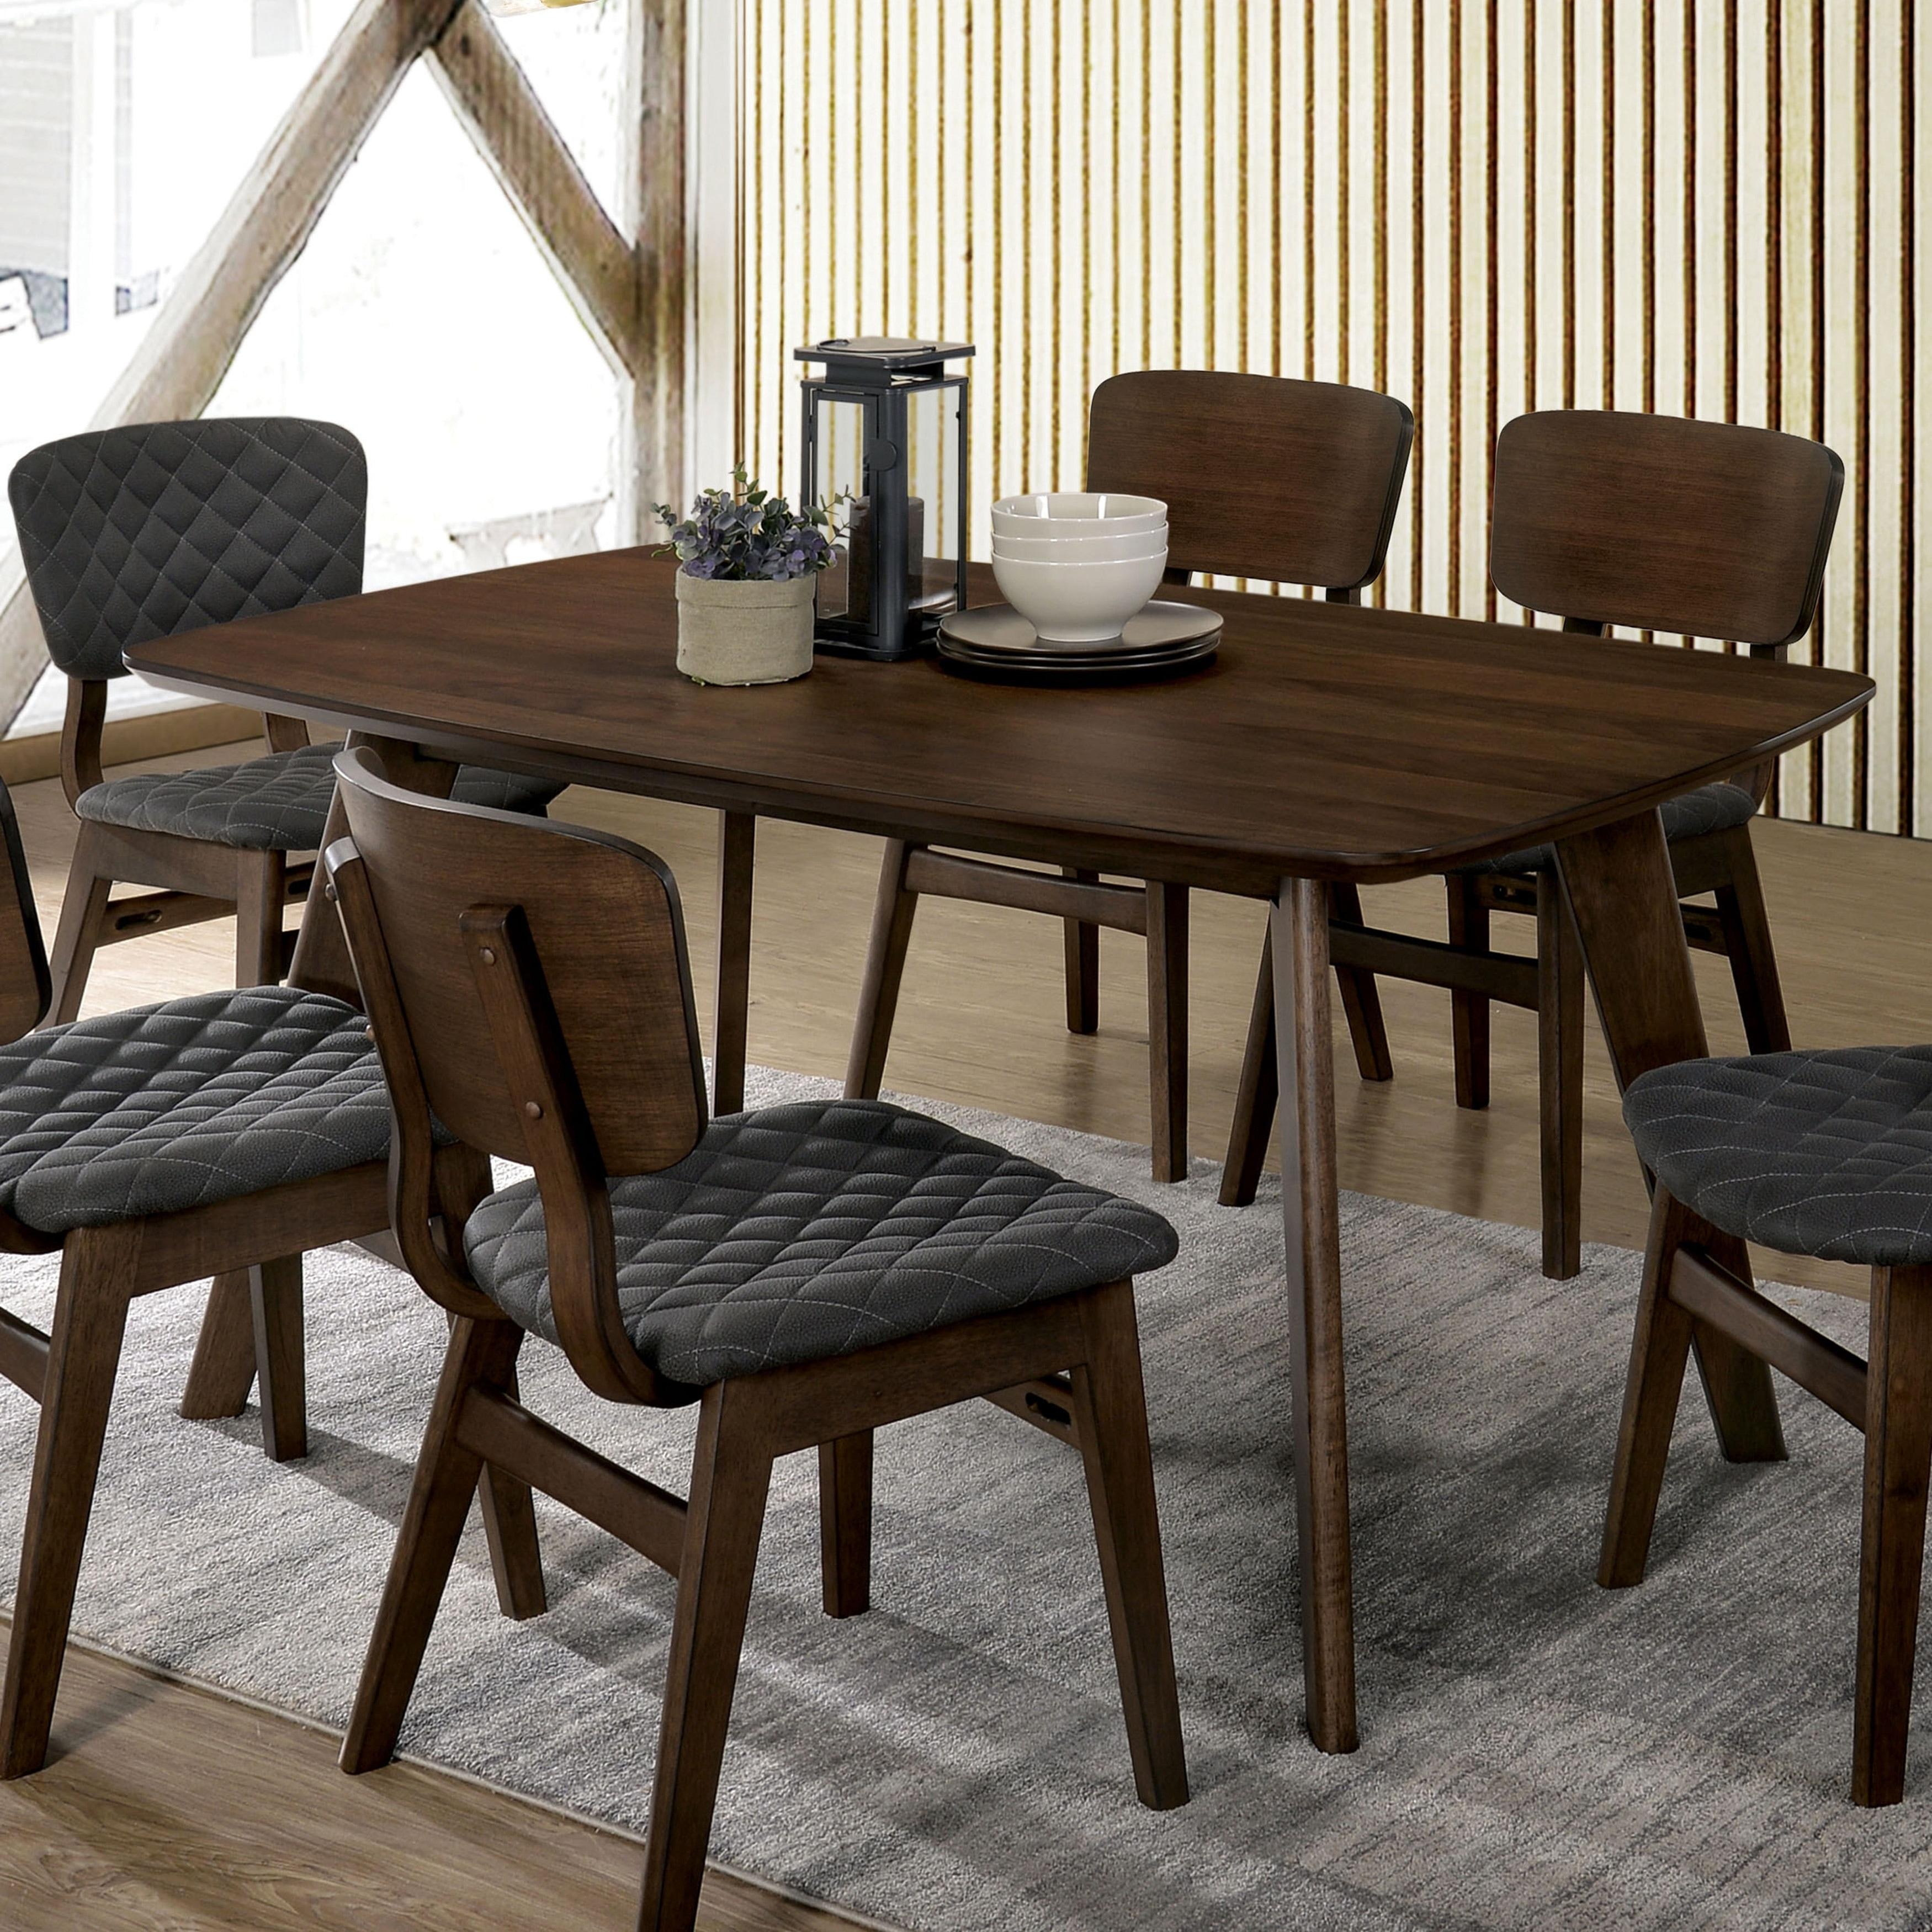 Furniture of america liam mid century modern dining table walnut